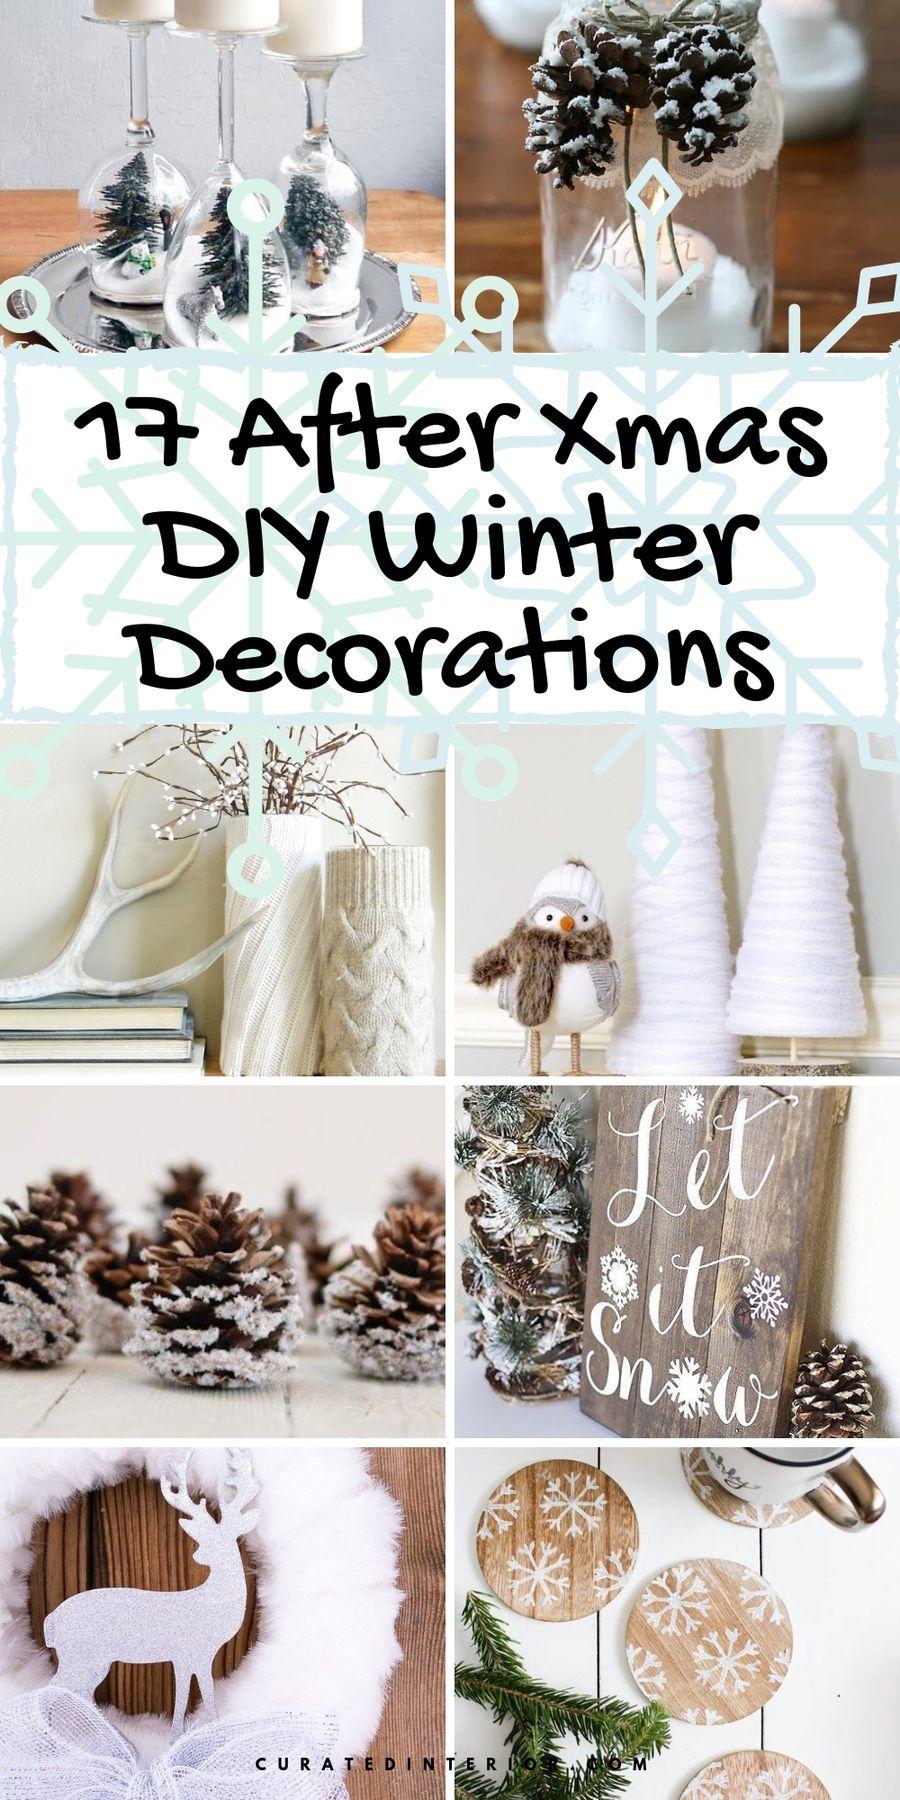 17 After Christmas DIY Winter Decorations #DIY #DIYDecor